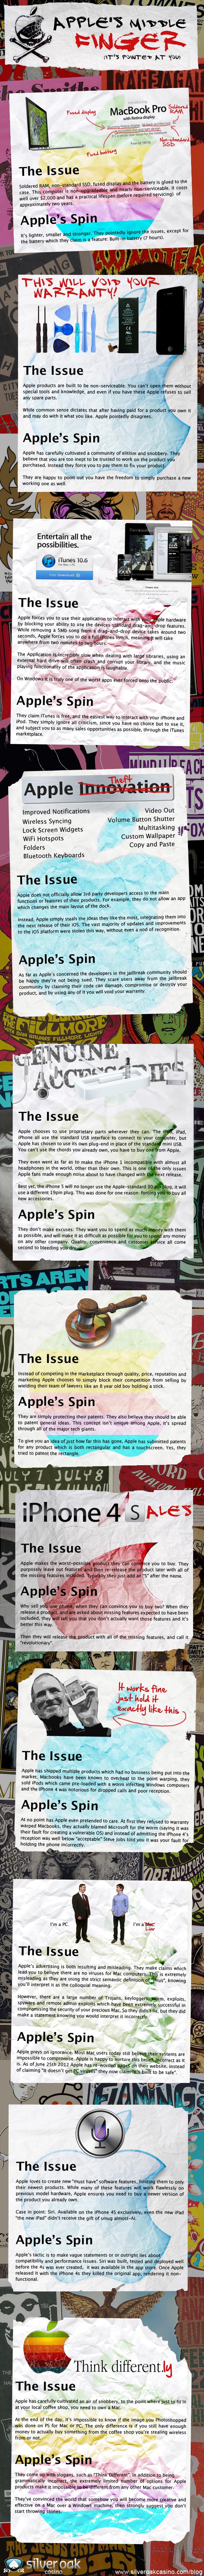 Apple add, Apple Add 2013